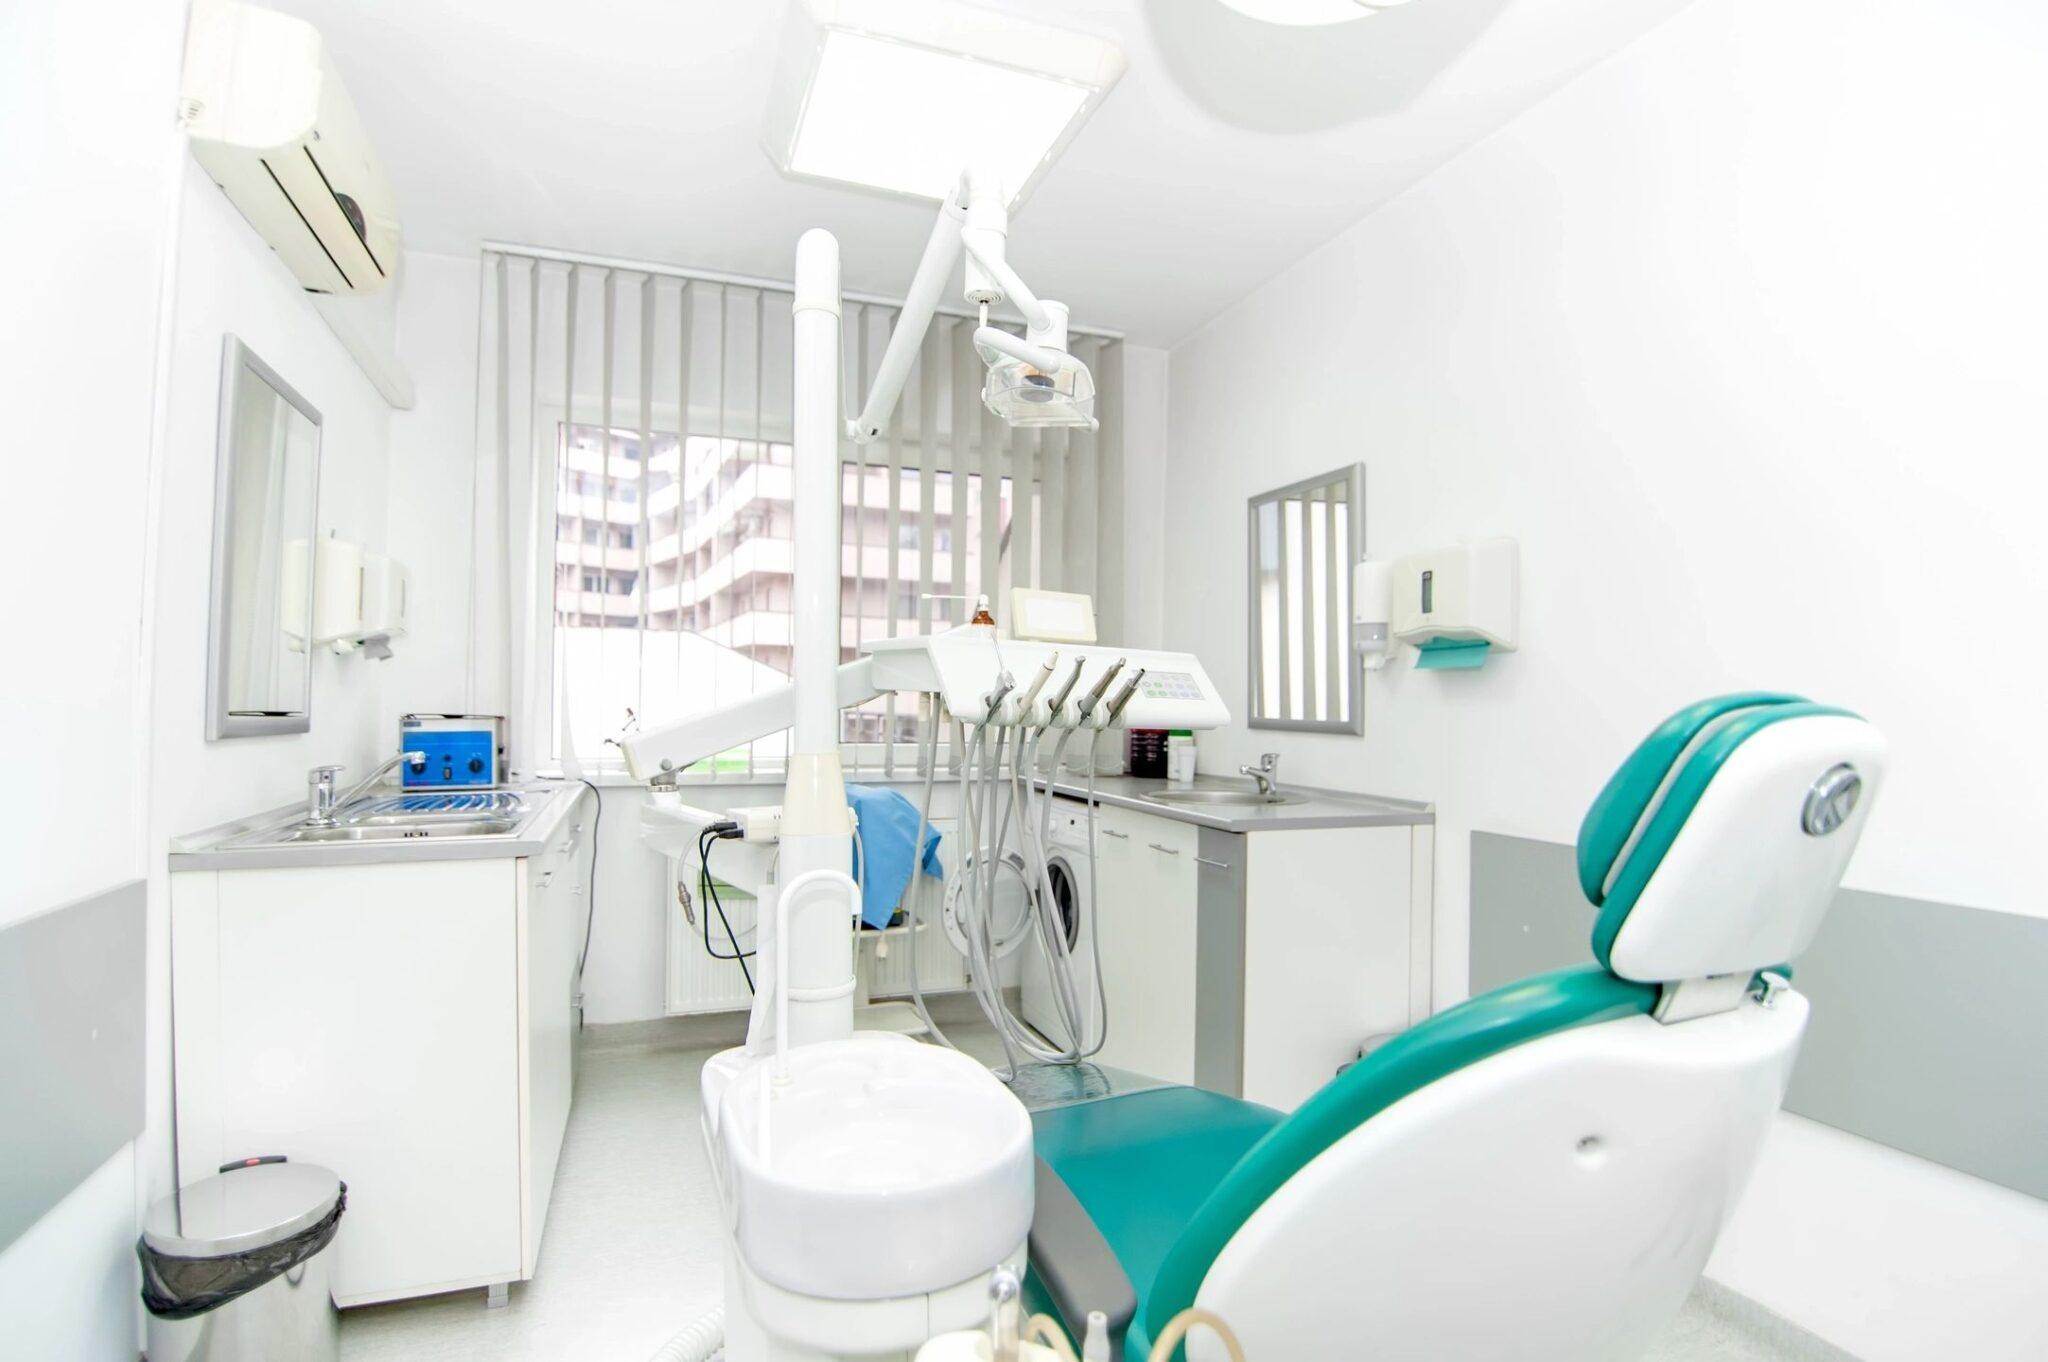 Dental Operatory Room Financing